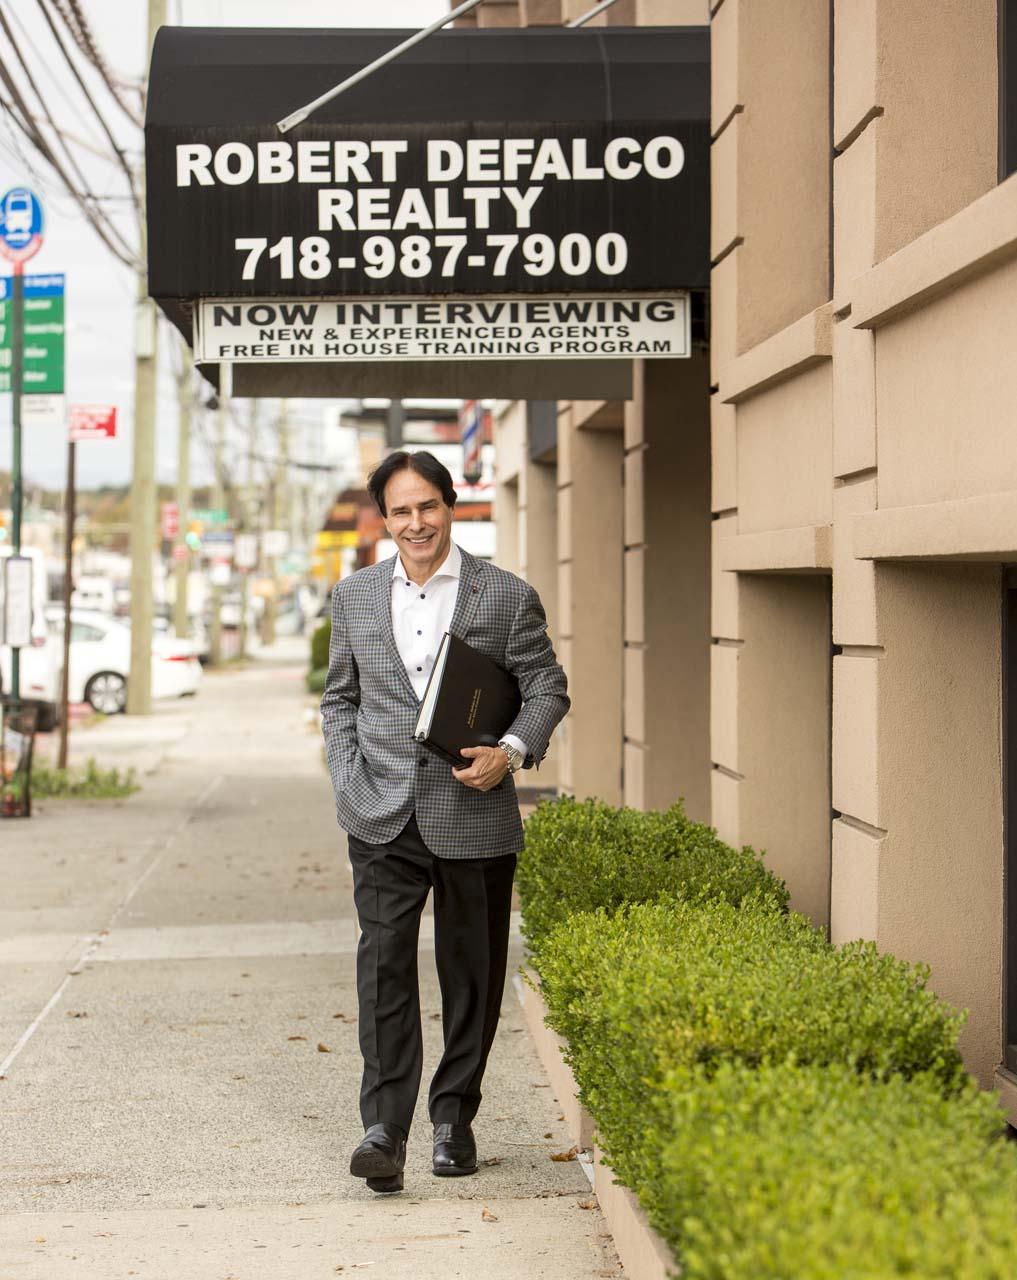 Robert DeFalco-110